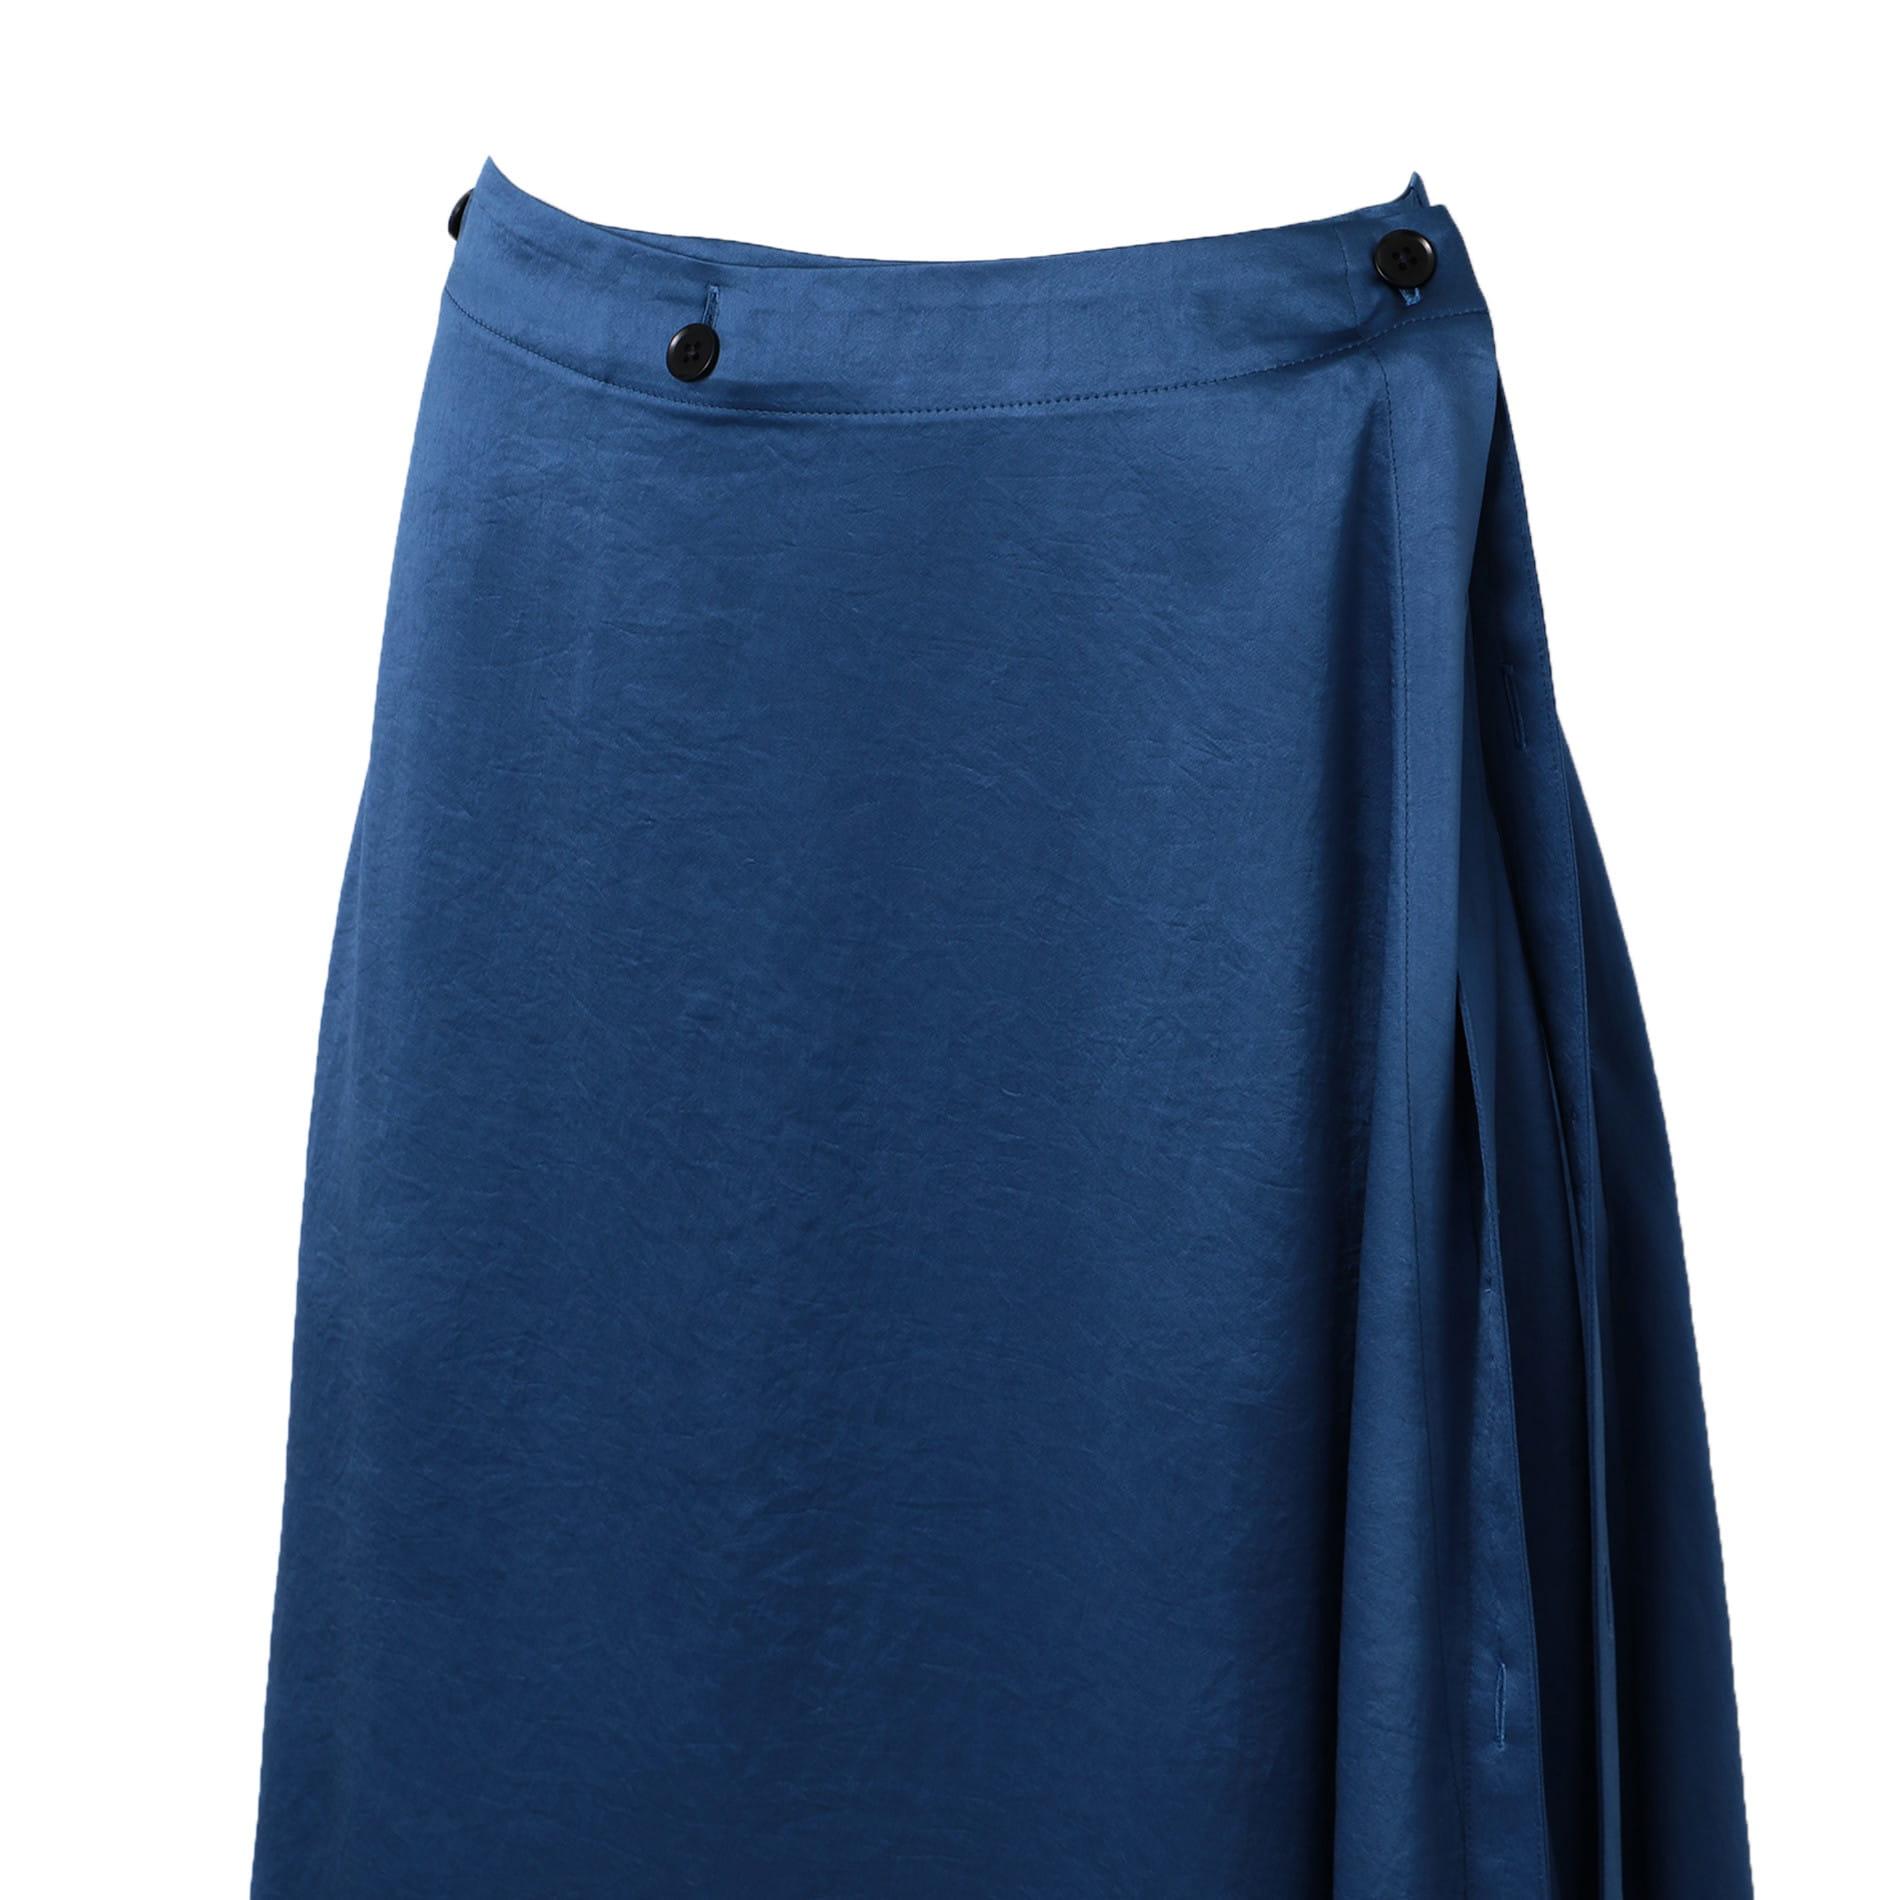 【08sircus】WOMEN ドレープラップスカート S19SL-SK03